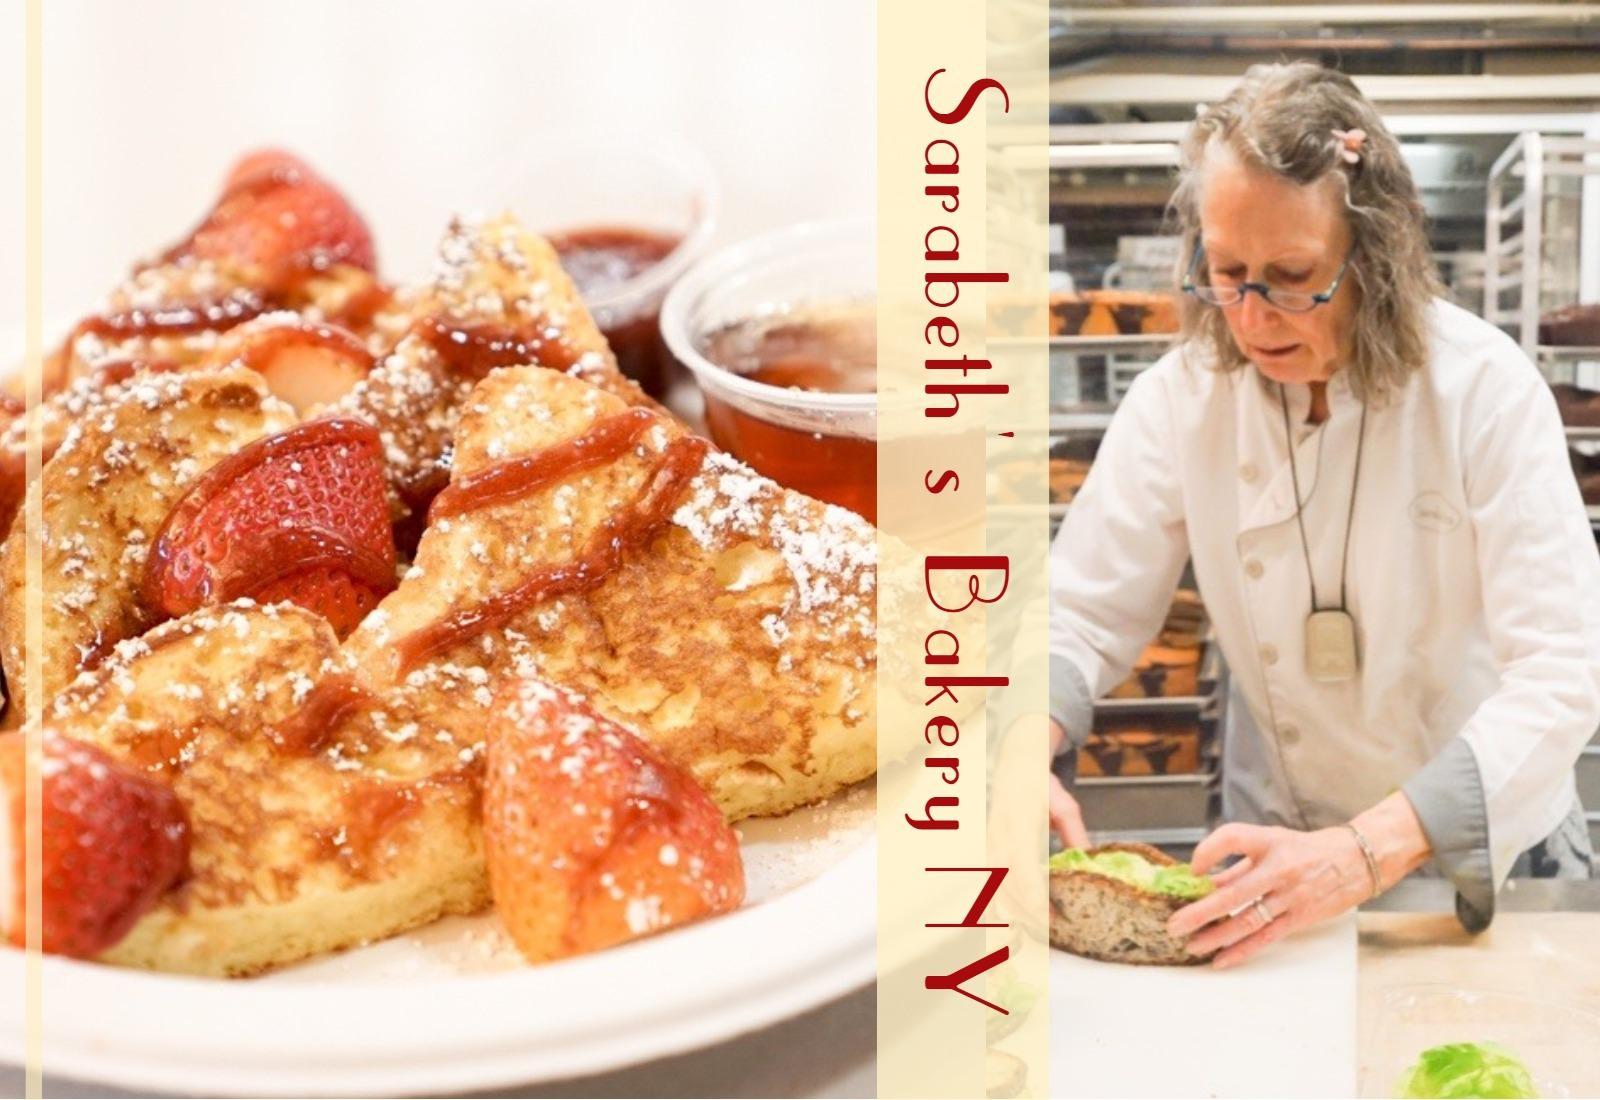 Sarabeth奶奶親手做草莓法式吐司Fat&Flutty給我吃!│紐約早午餐Sarabeth's Bakery雀兒喜市場分店